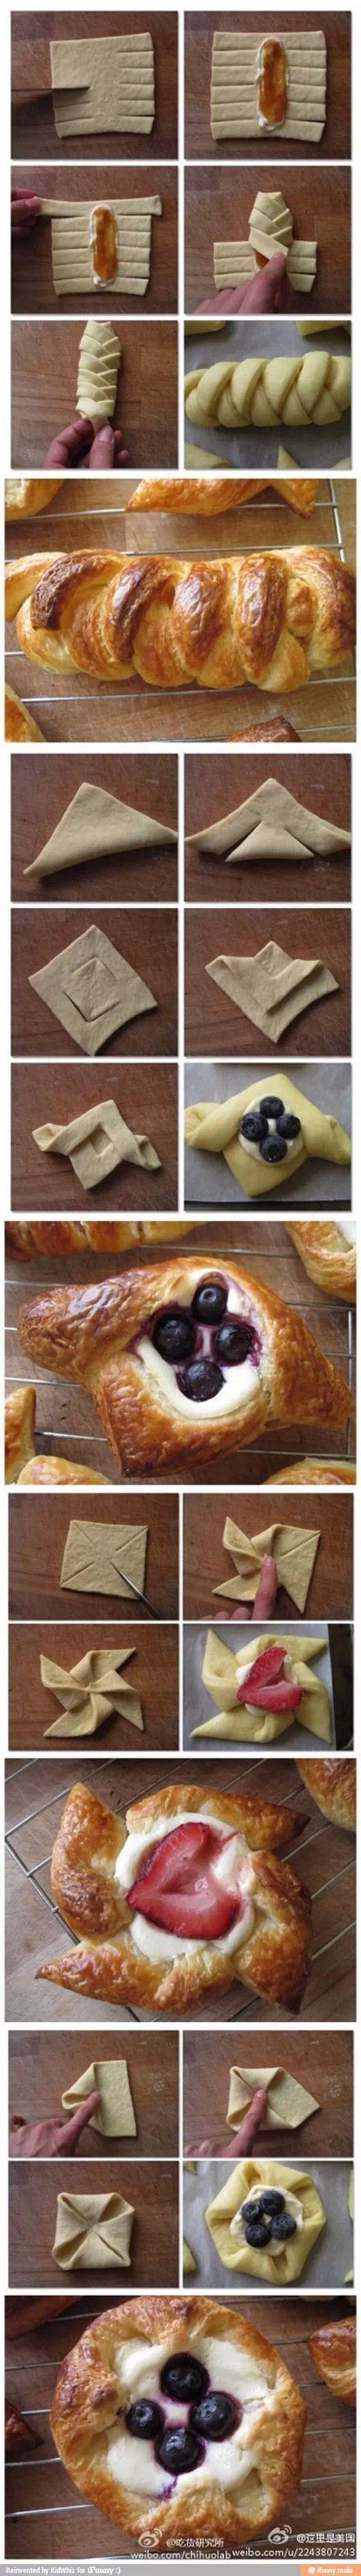 Ways to good pastries!